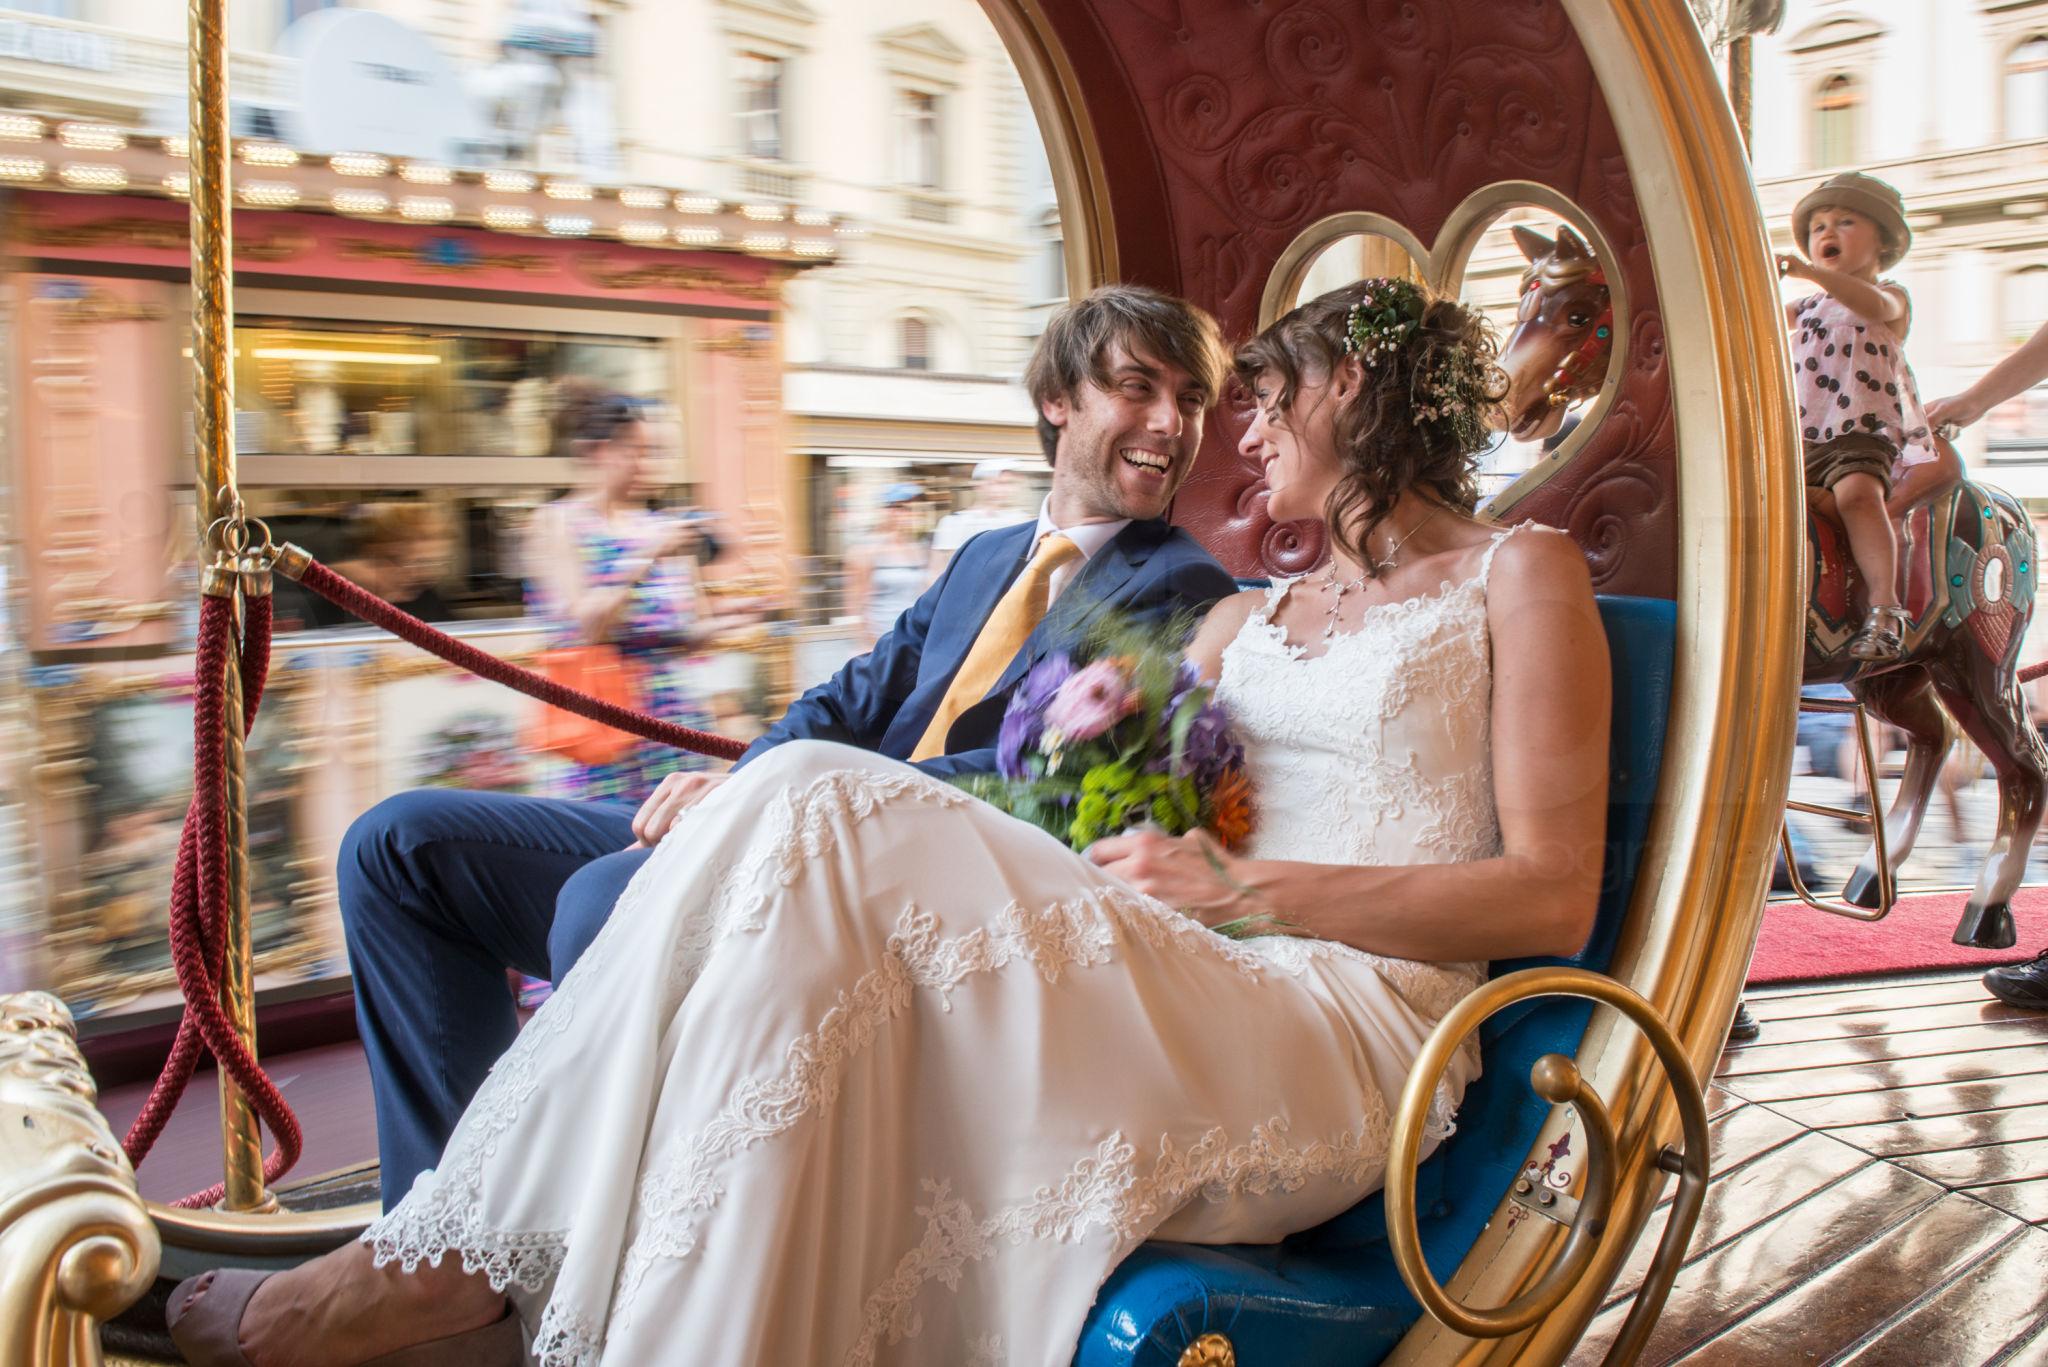 http://lnx.mirkone.it/wp-content/uploads/2015/07/fotografo-matrimoni-faenza-0027-2.jpg